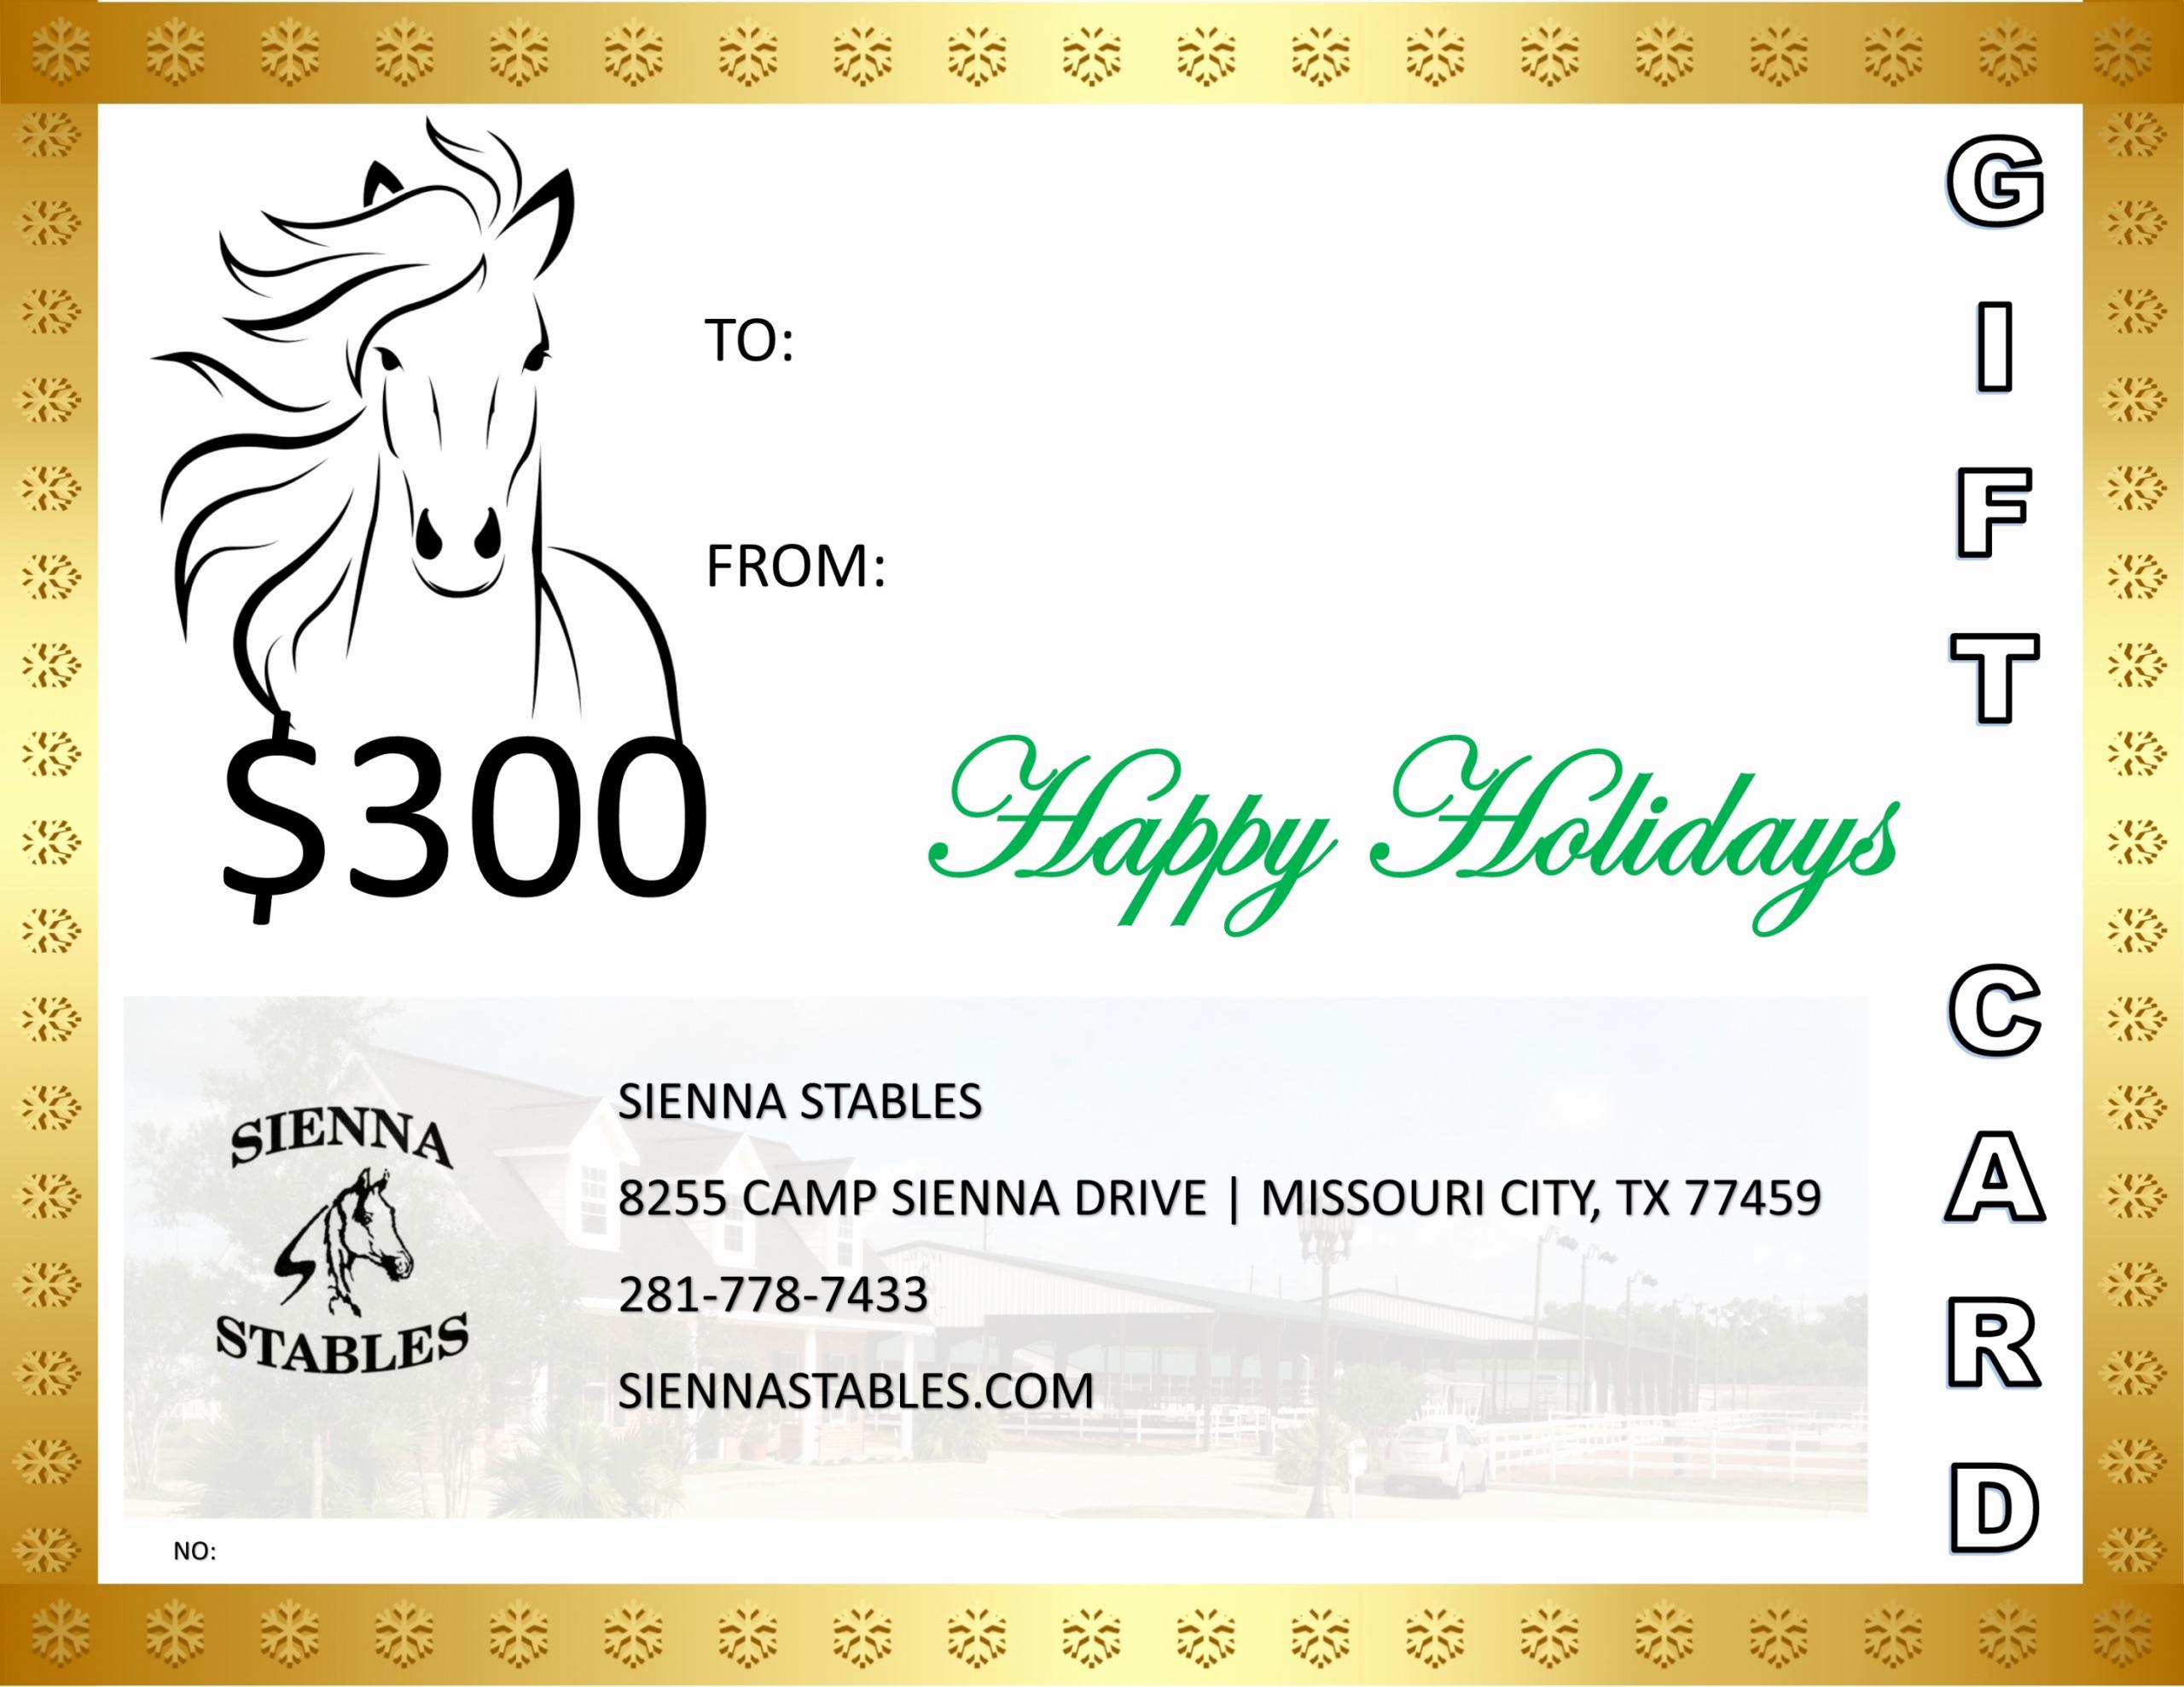 Horseback Riding Gift Certificate Template Best Of Horse Gift Certificate Template Free